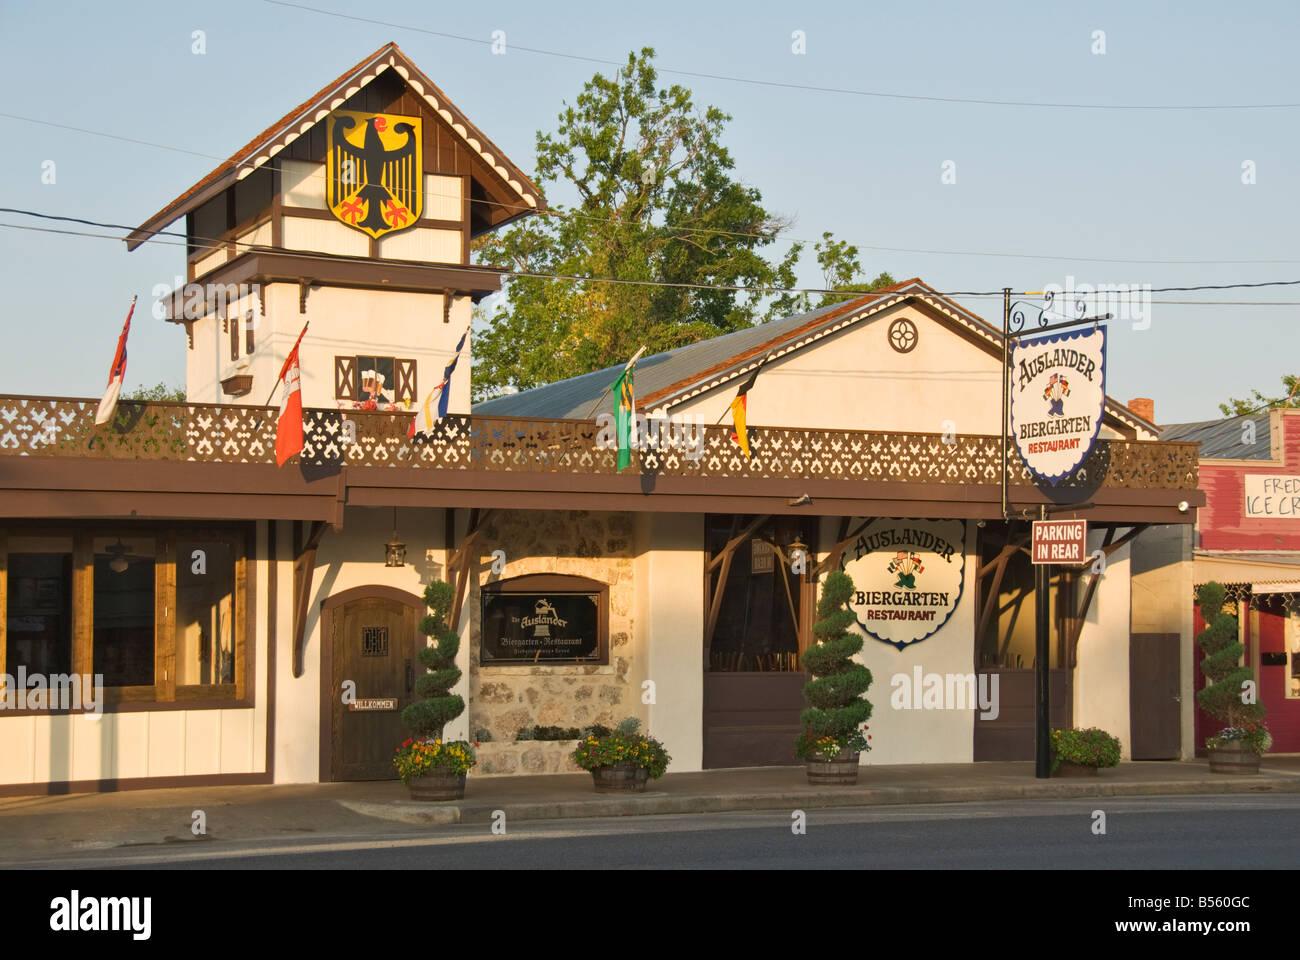 Texas Hill Country Fredericksburg Auslander Biergarten Restaurant beer garden Banque D'Images